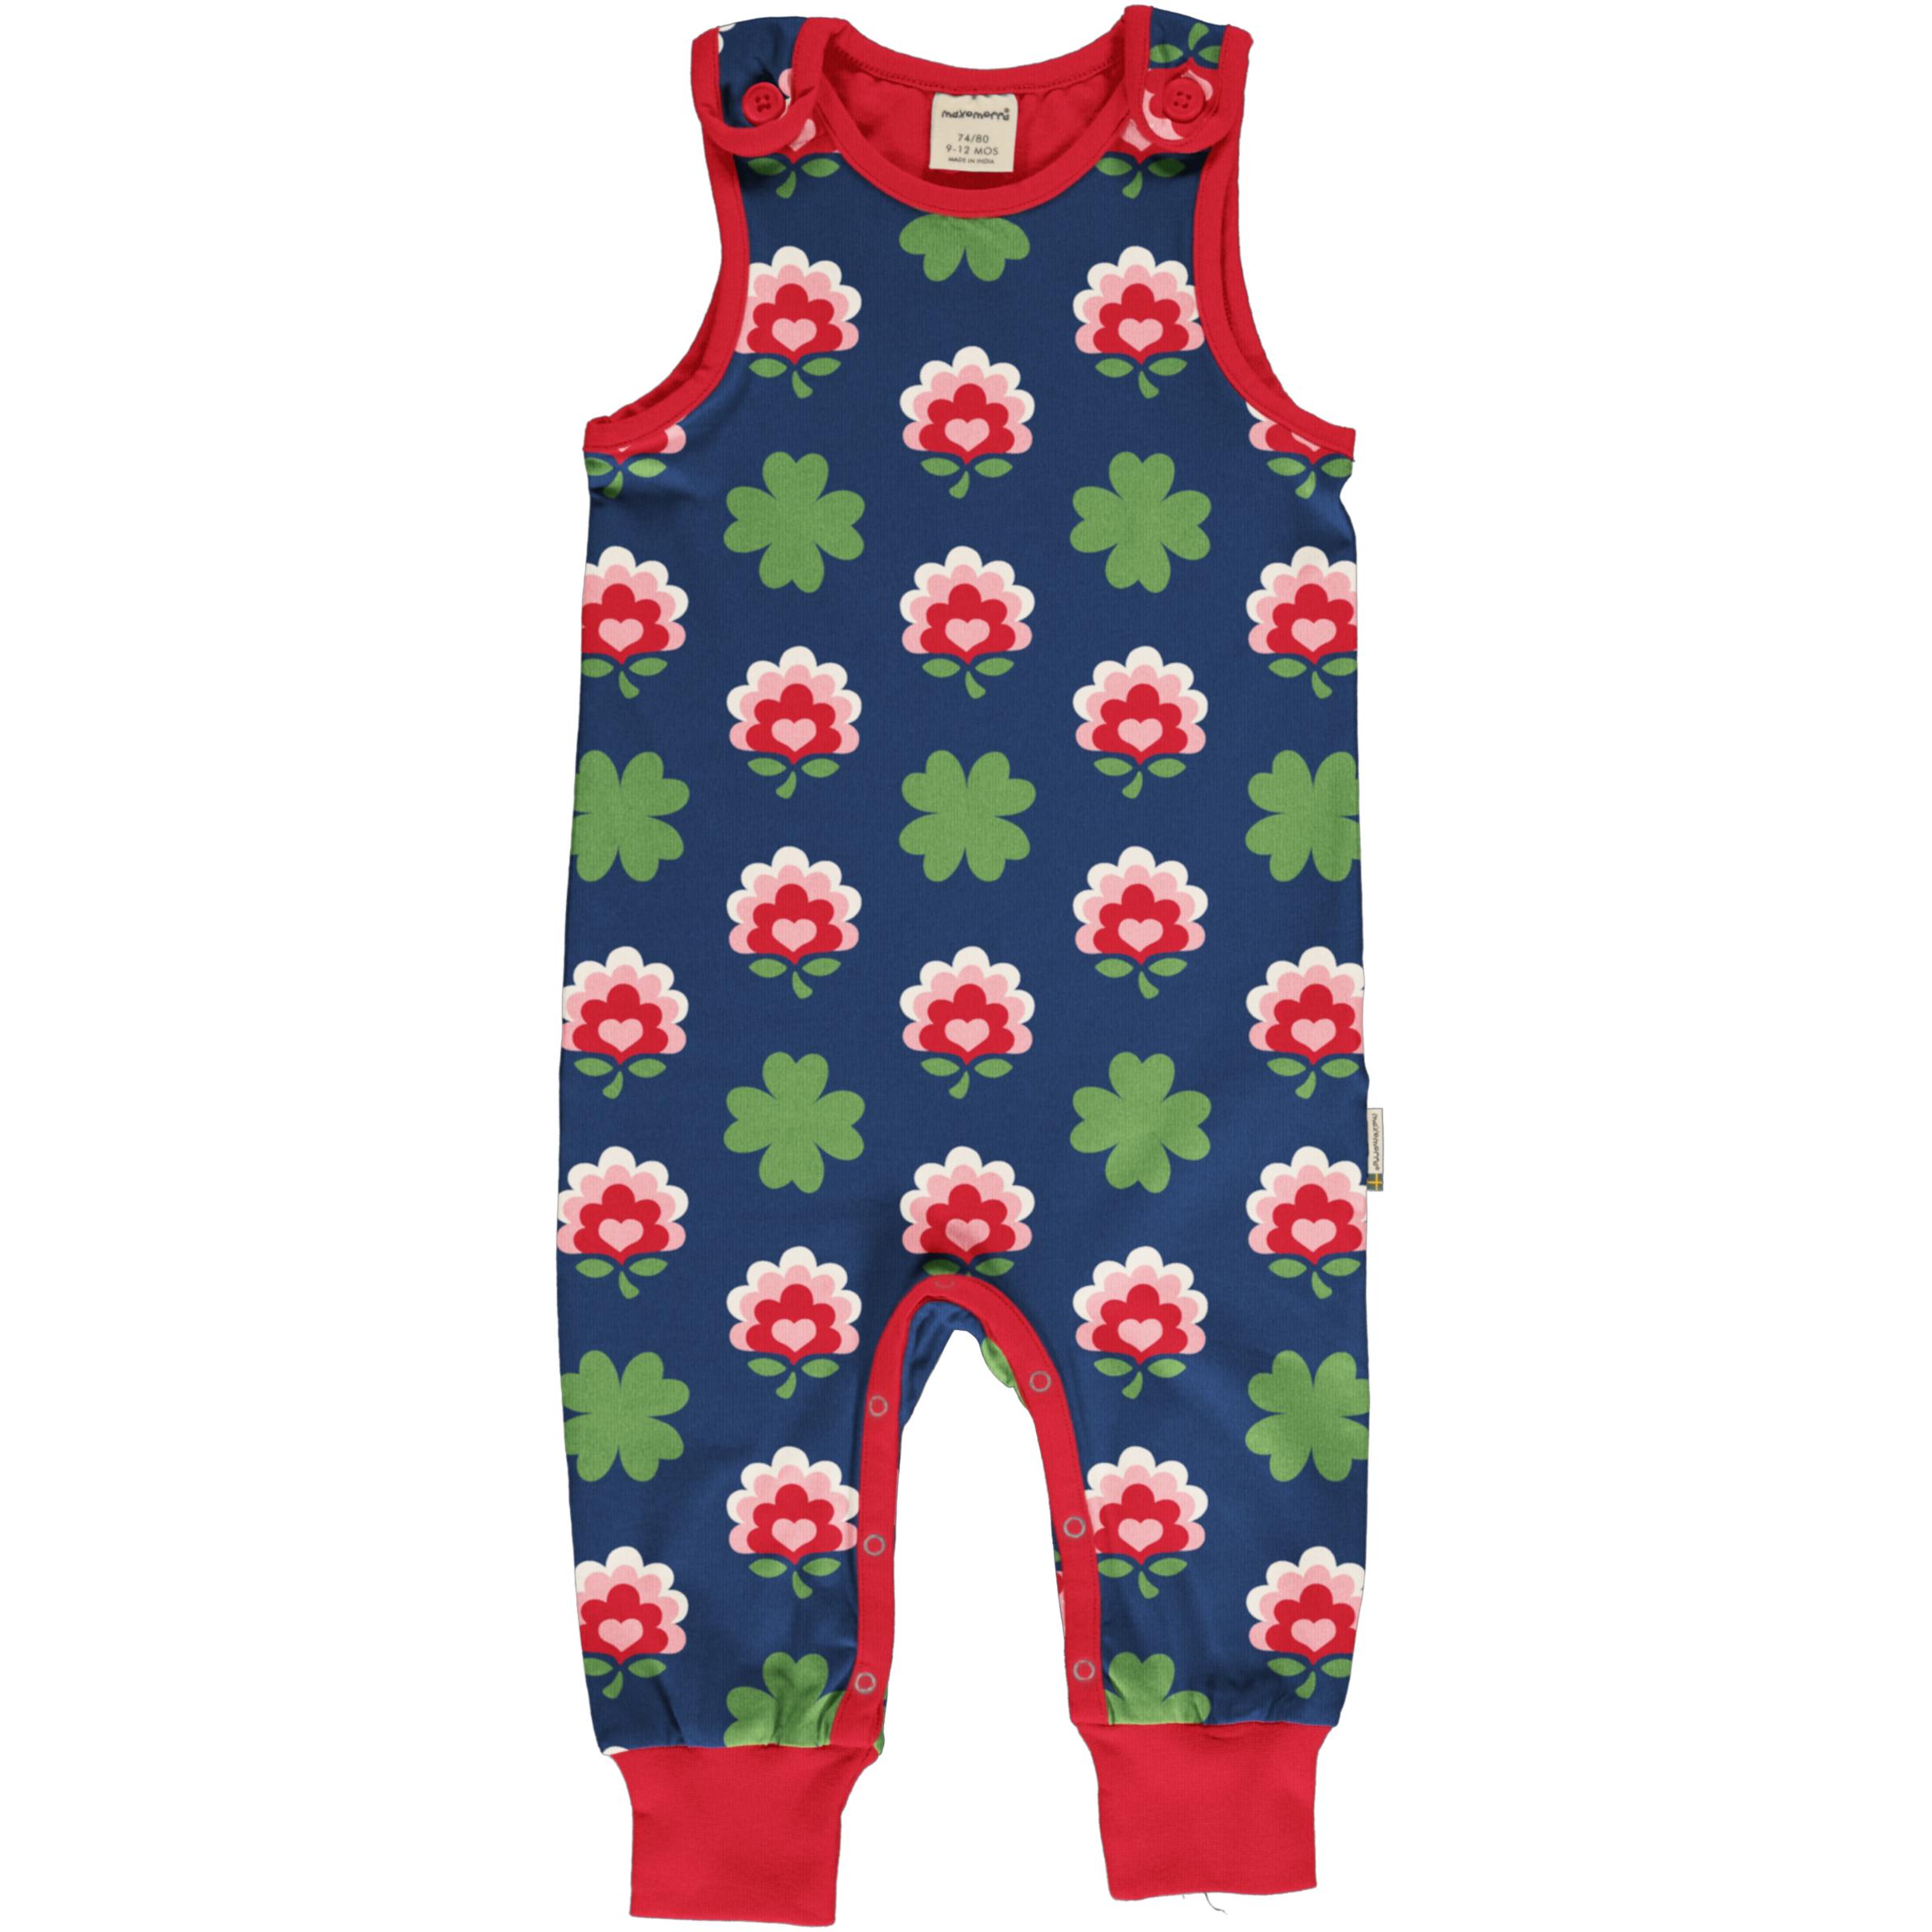 Maxomorra Baby Playsuit CLOVER 086/092